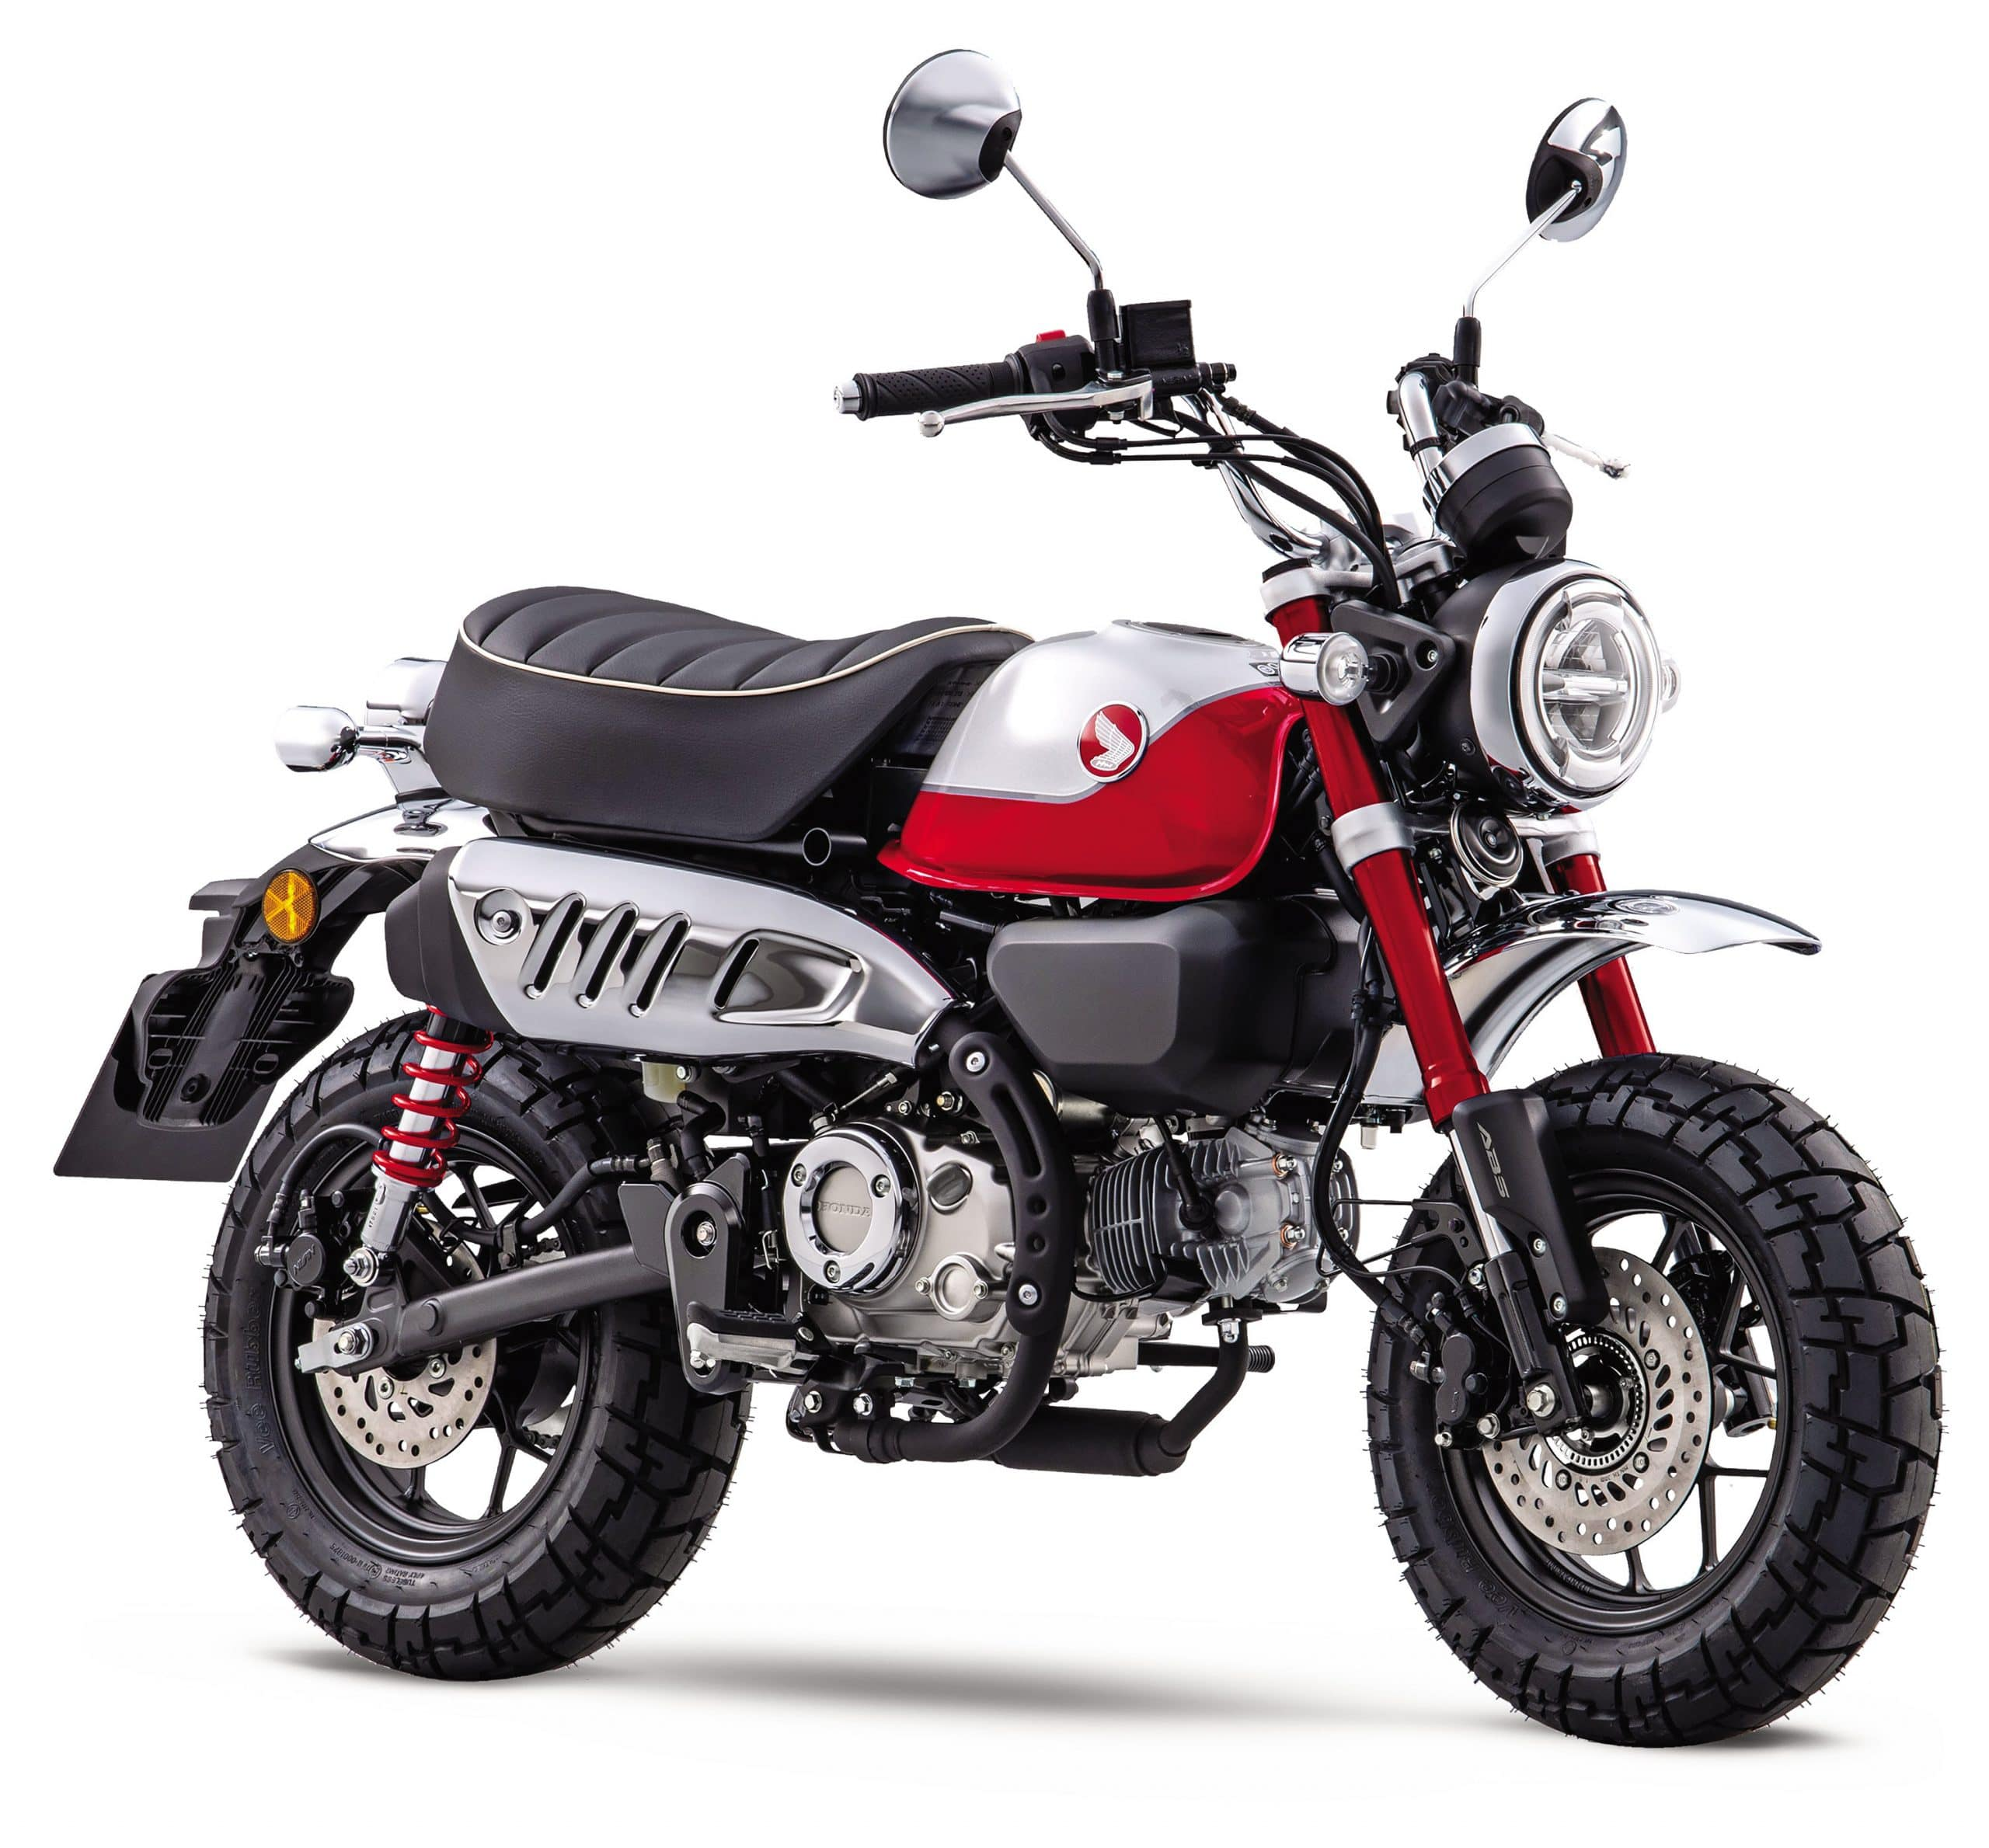 The 2022 Honda Monkey with its more retro look. Source : https://motorcycle.honda.ca/model/minimoto/monkey/2022